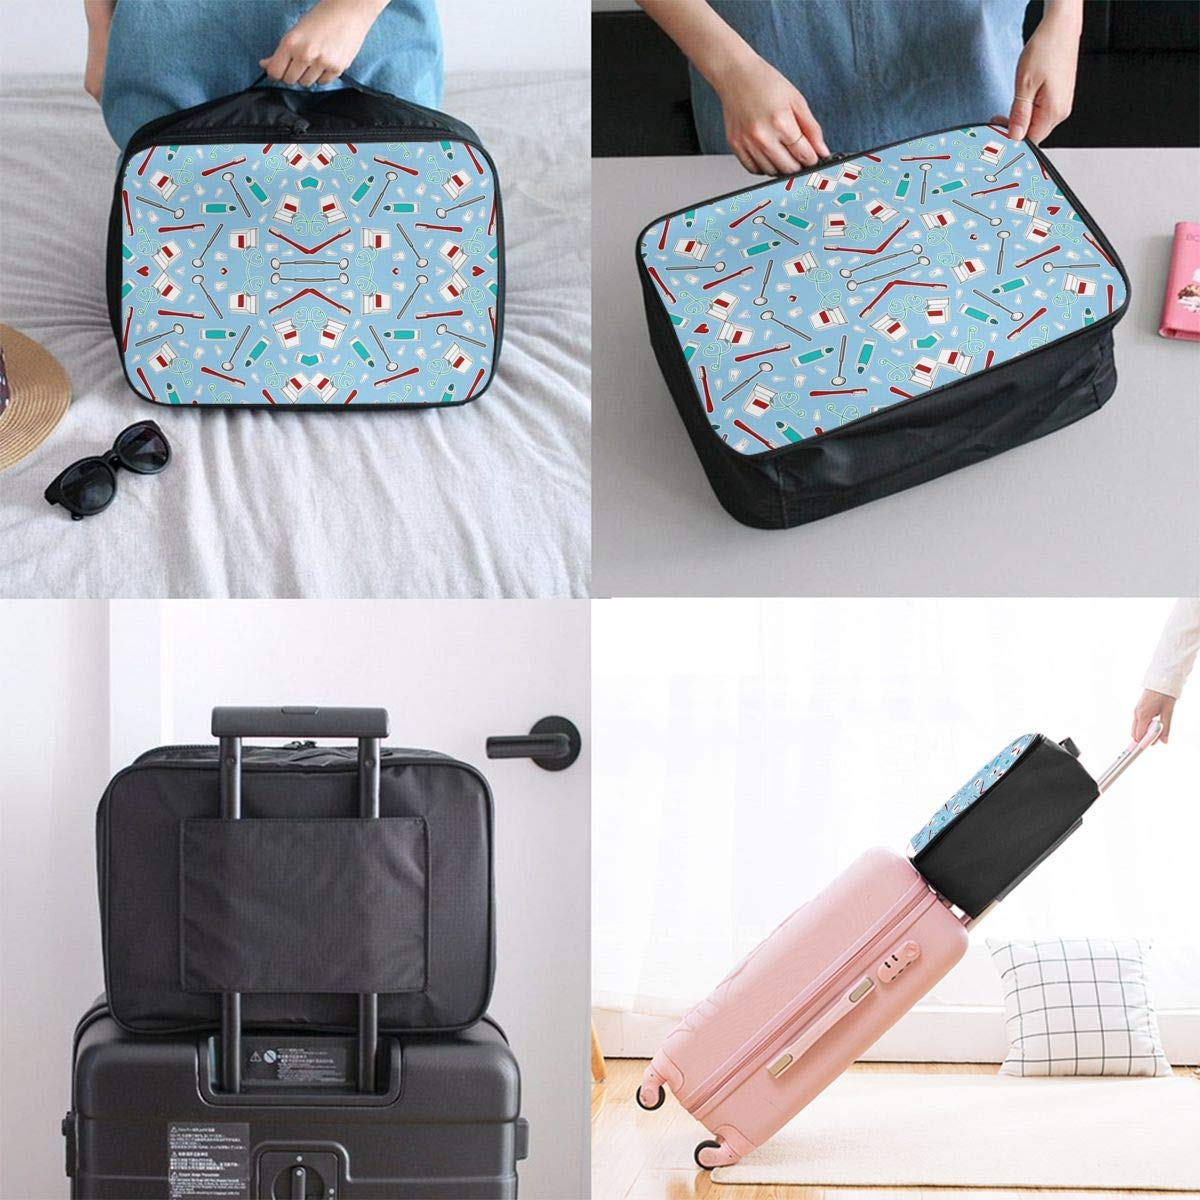 JTRVW Luggage Bags for Travel Travel Duffel Bag Waterproof Fashion Lightweight Large Capacity Portable Duffel Bag for Men /& Women Cute Dentist Dental Hygienist Print Blue